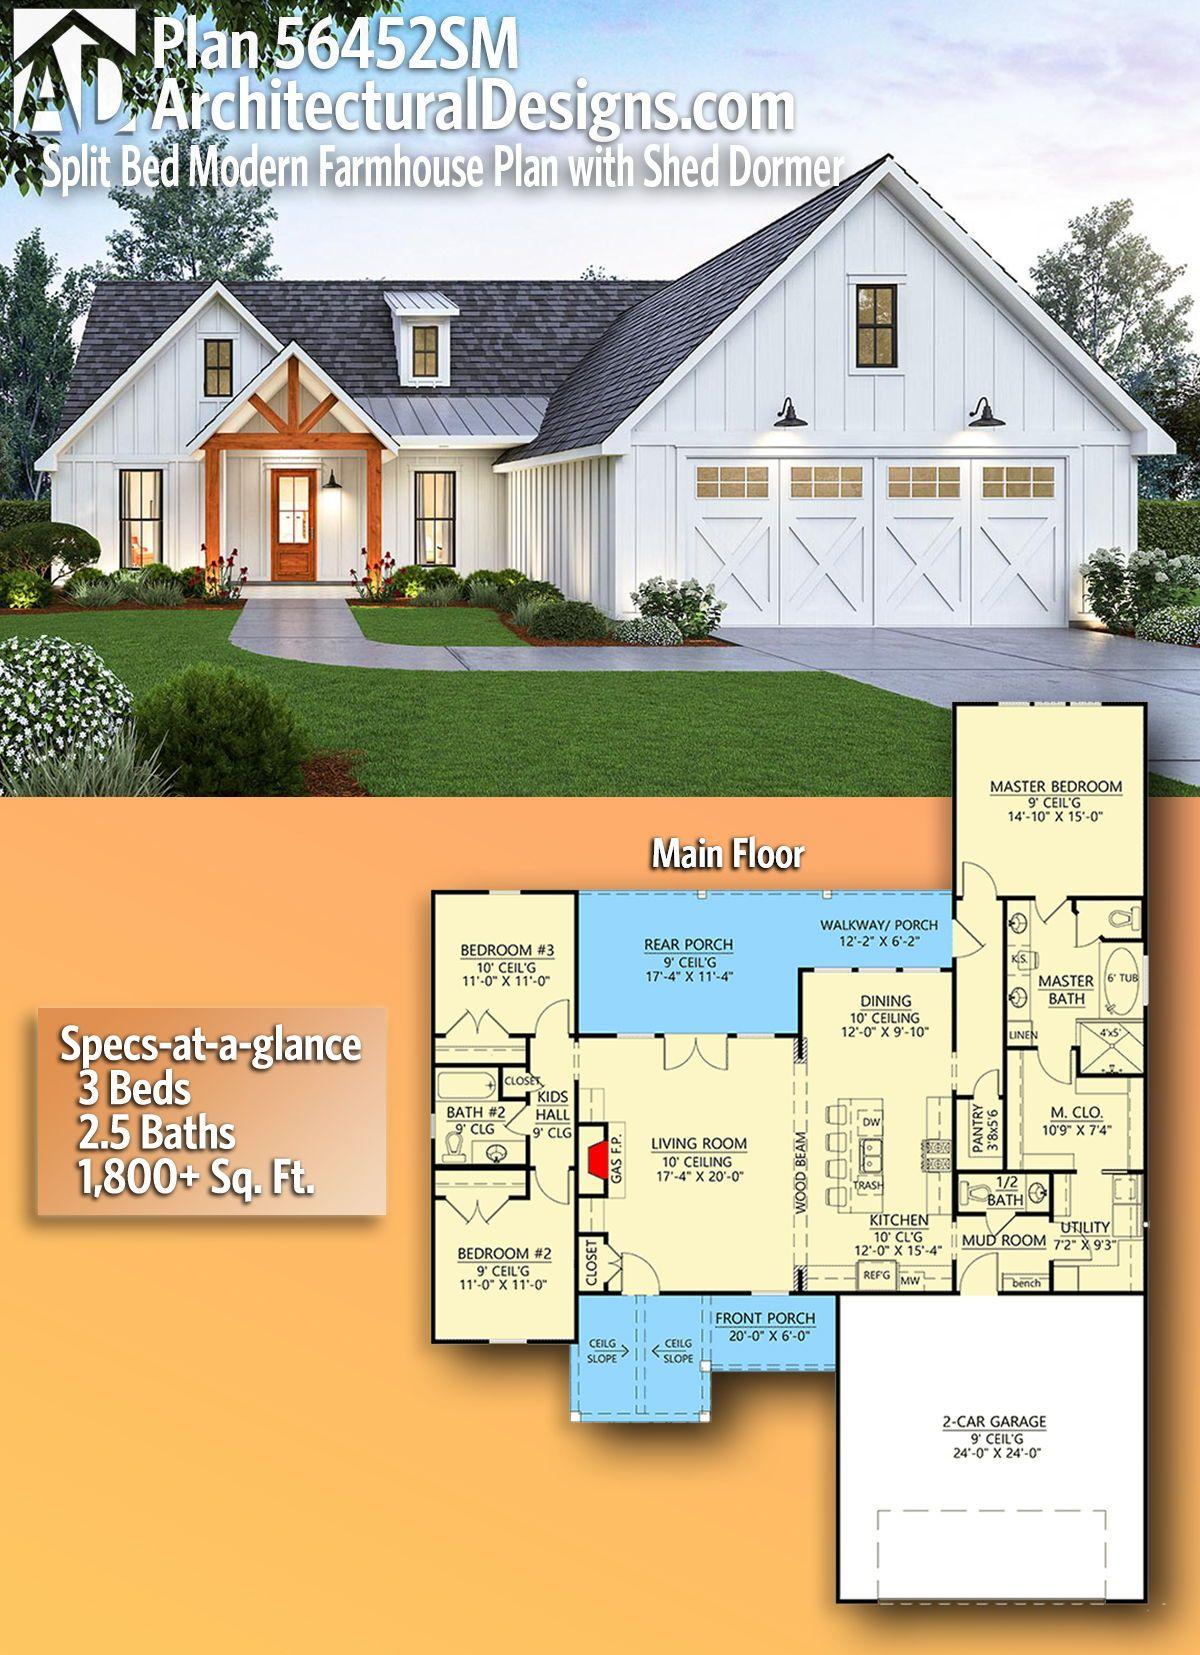 Plan 56452sm Split Bed Modern Farmhouse Plan With Shed